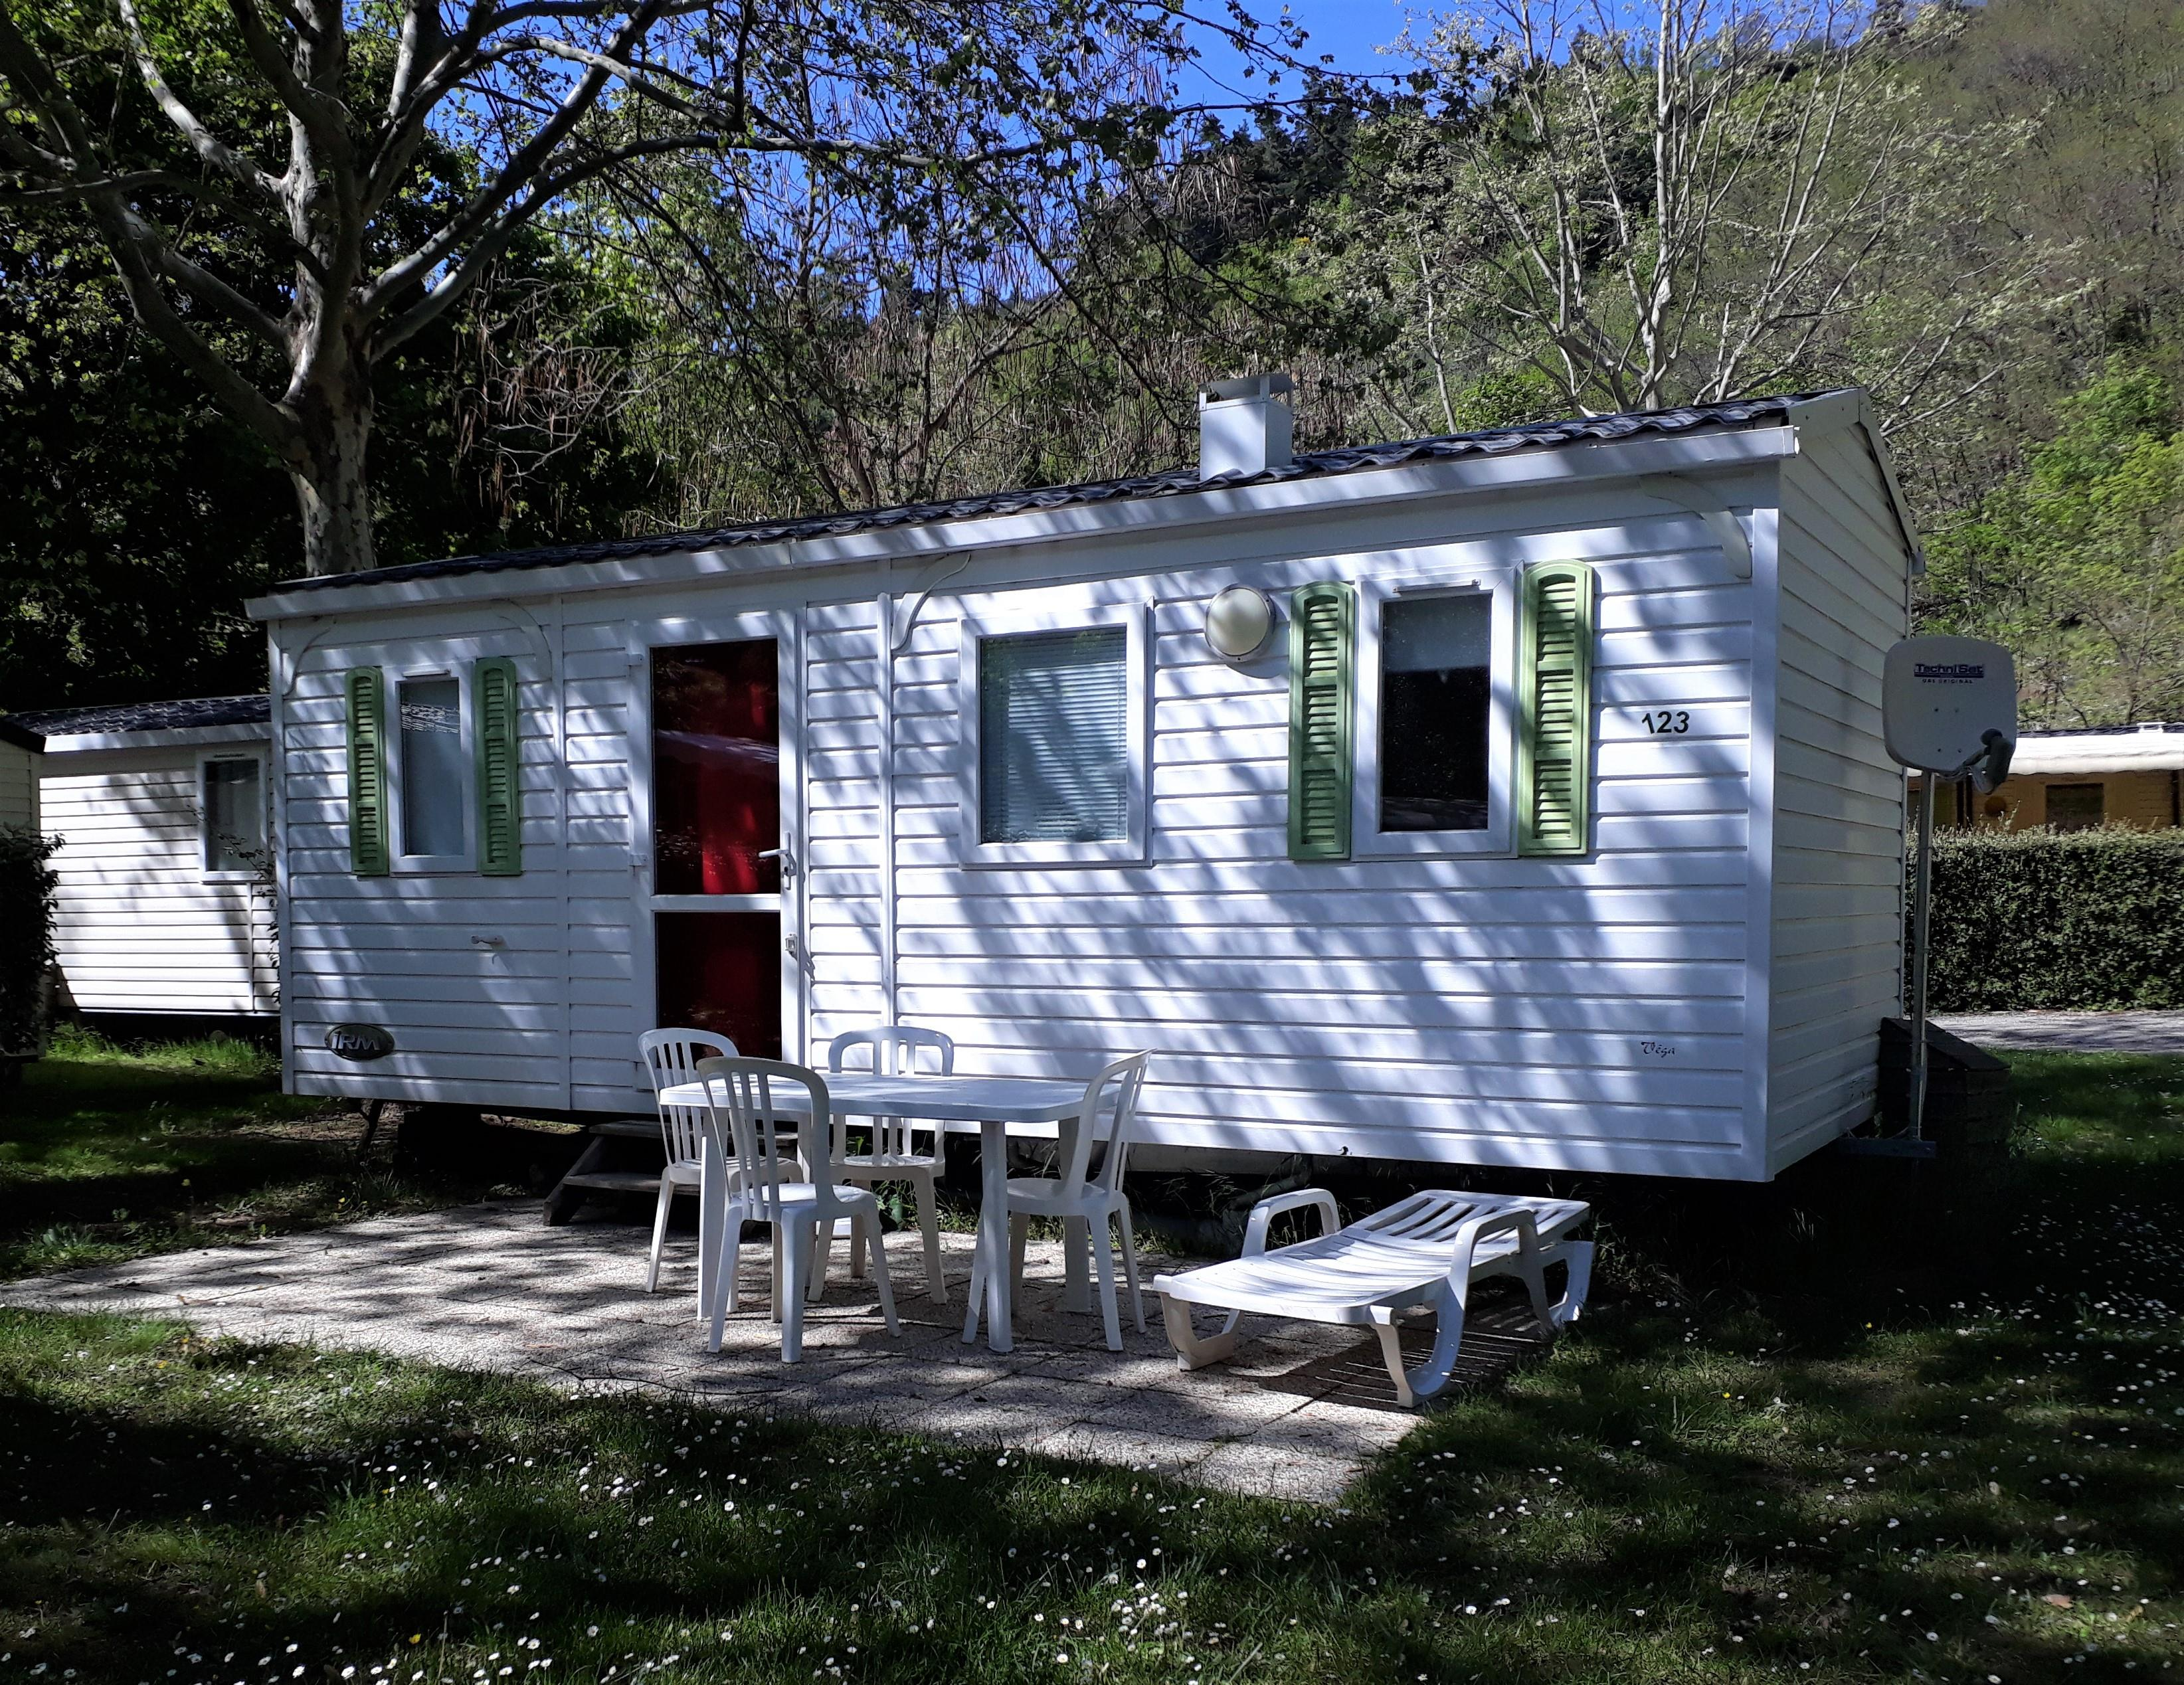 Location - Mobil-Home Compact - Camping de Retourtour